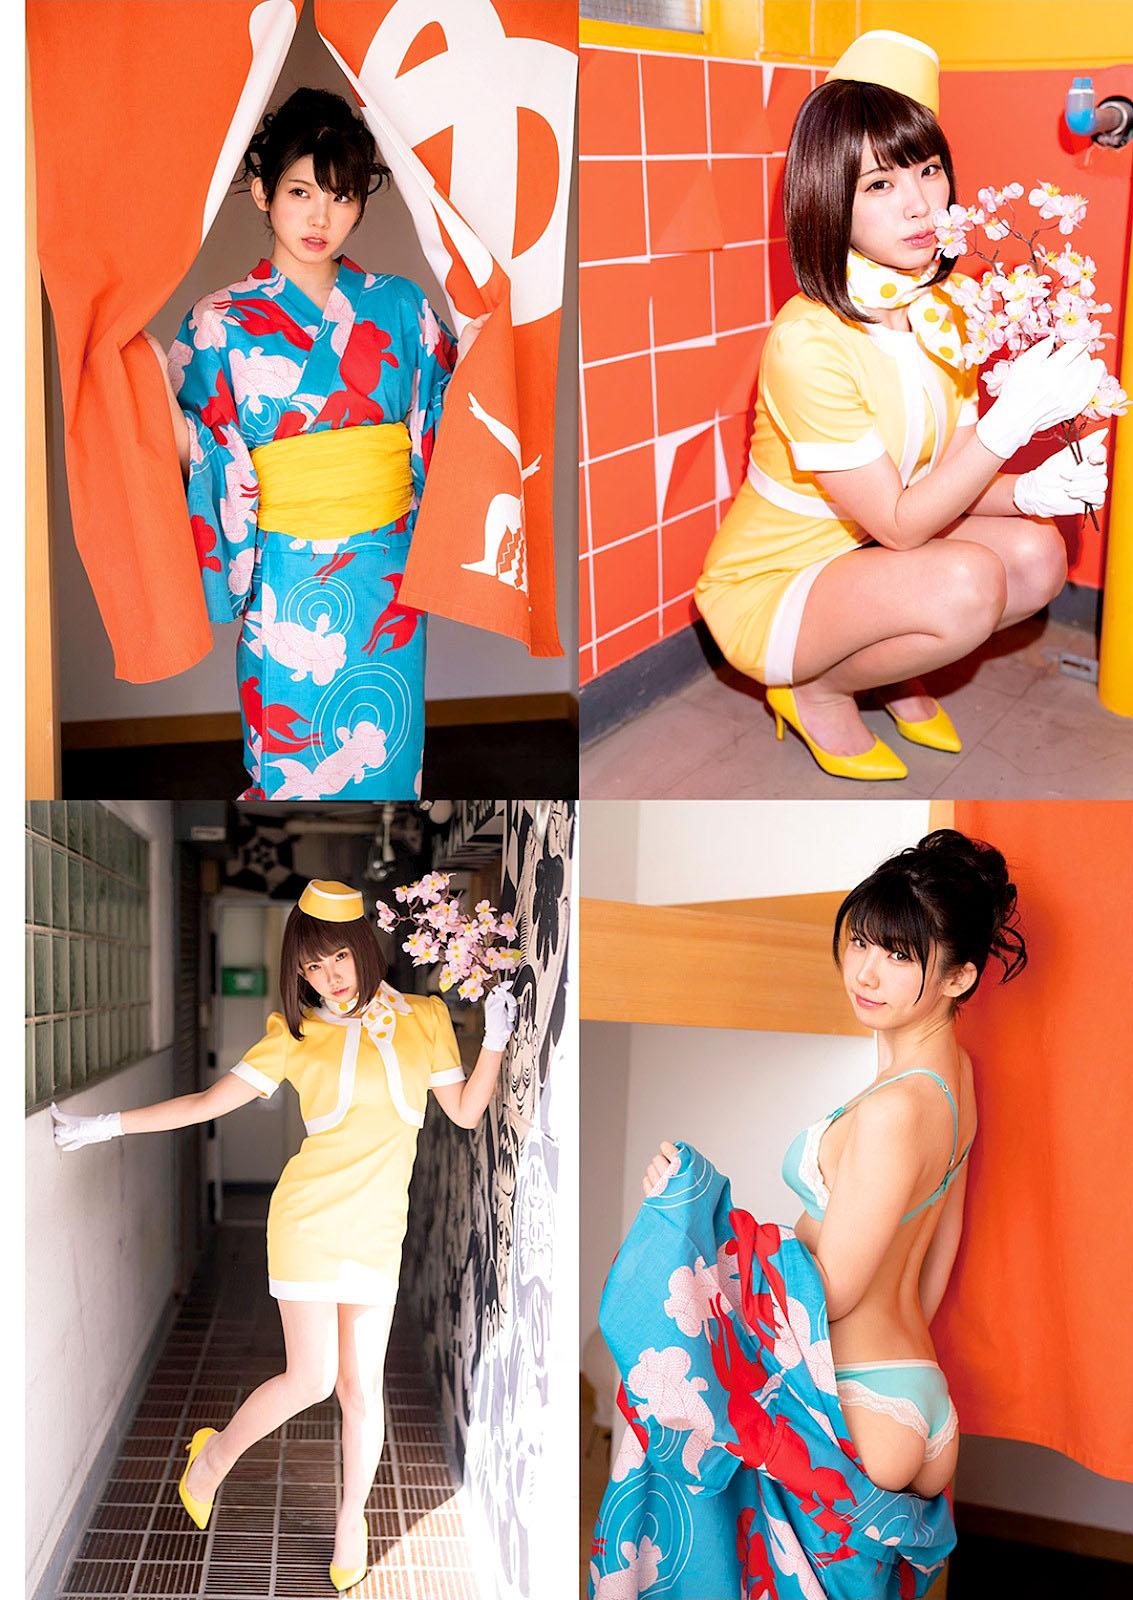 Enako Manga Action 210406 03.jpg